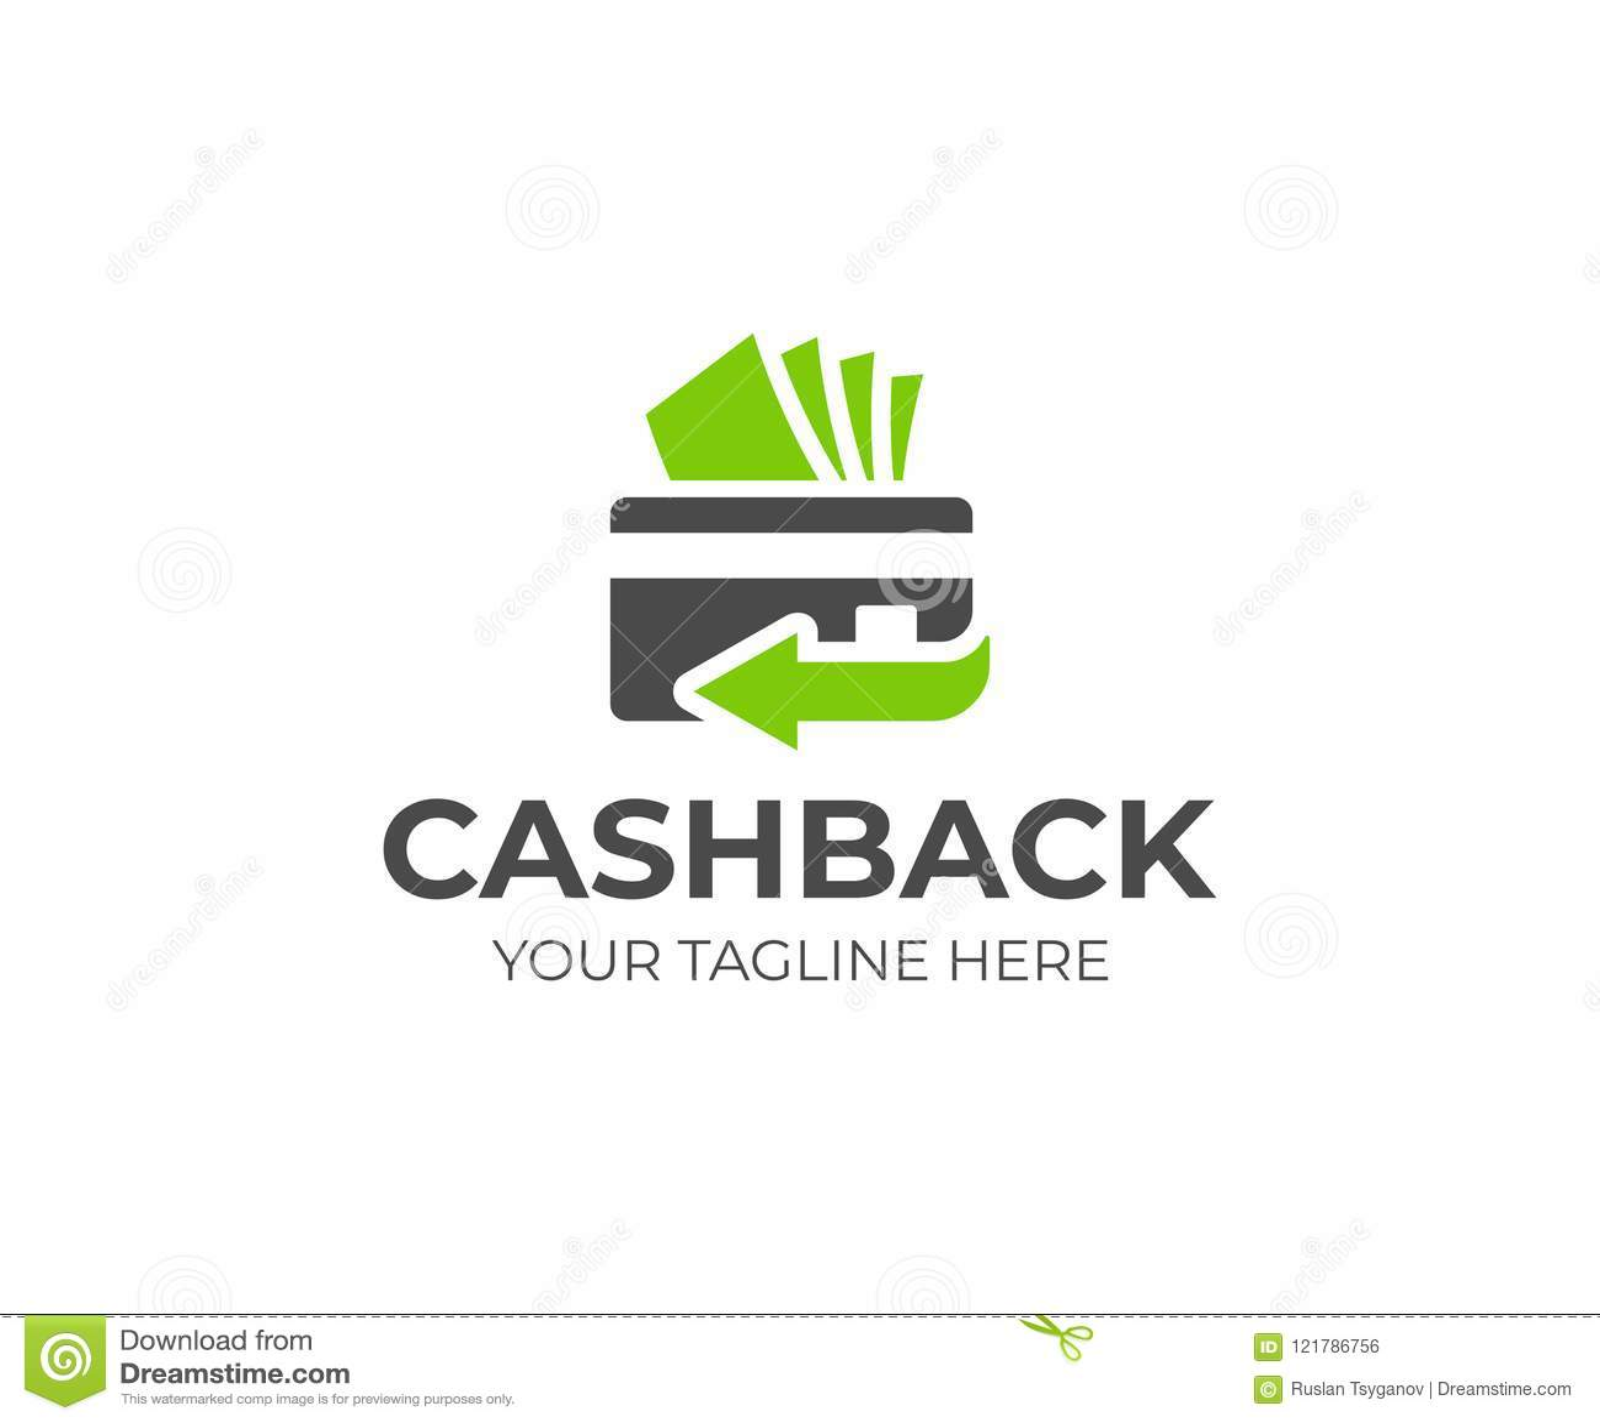 Cash back service logo template. Credit card and money vector design